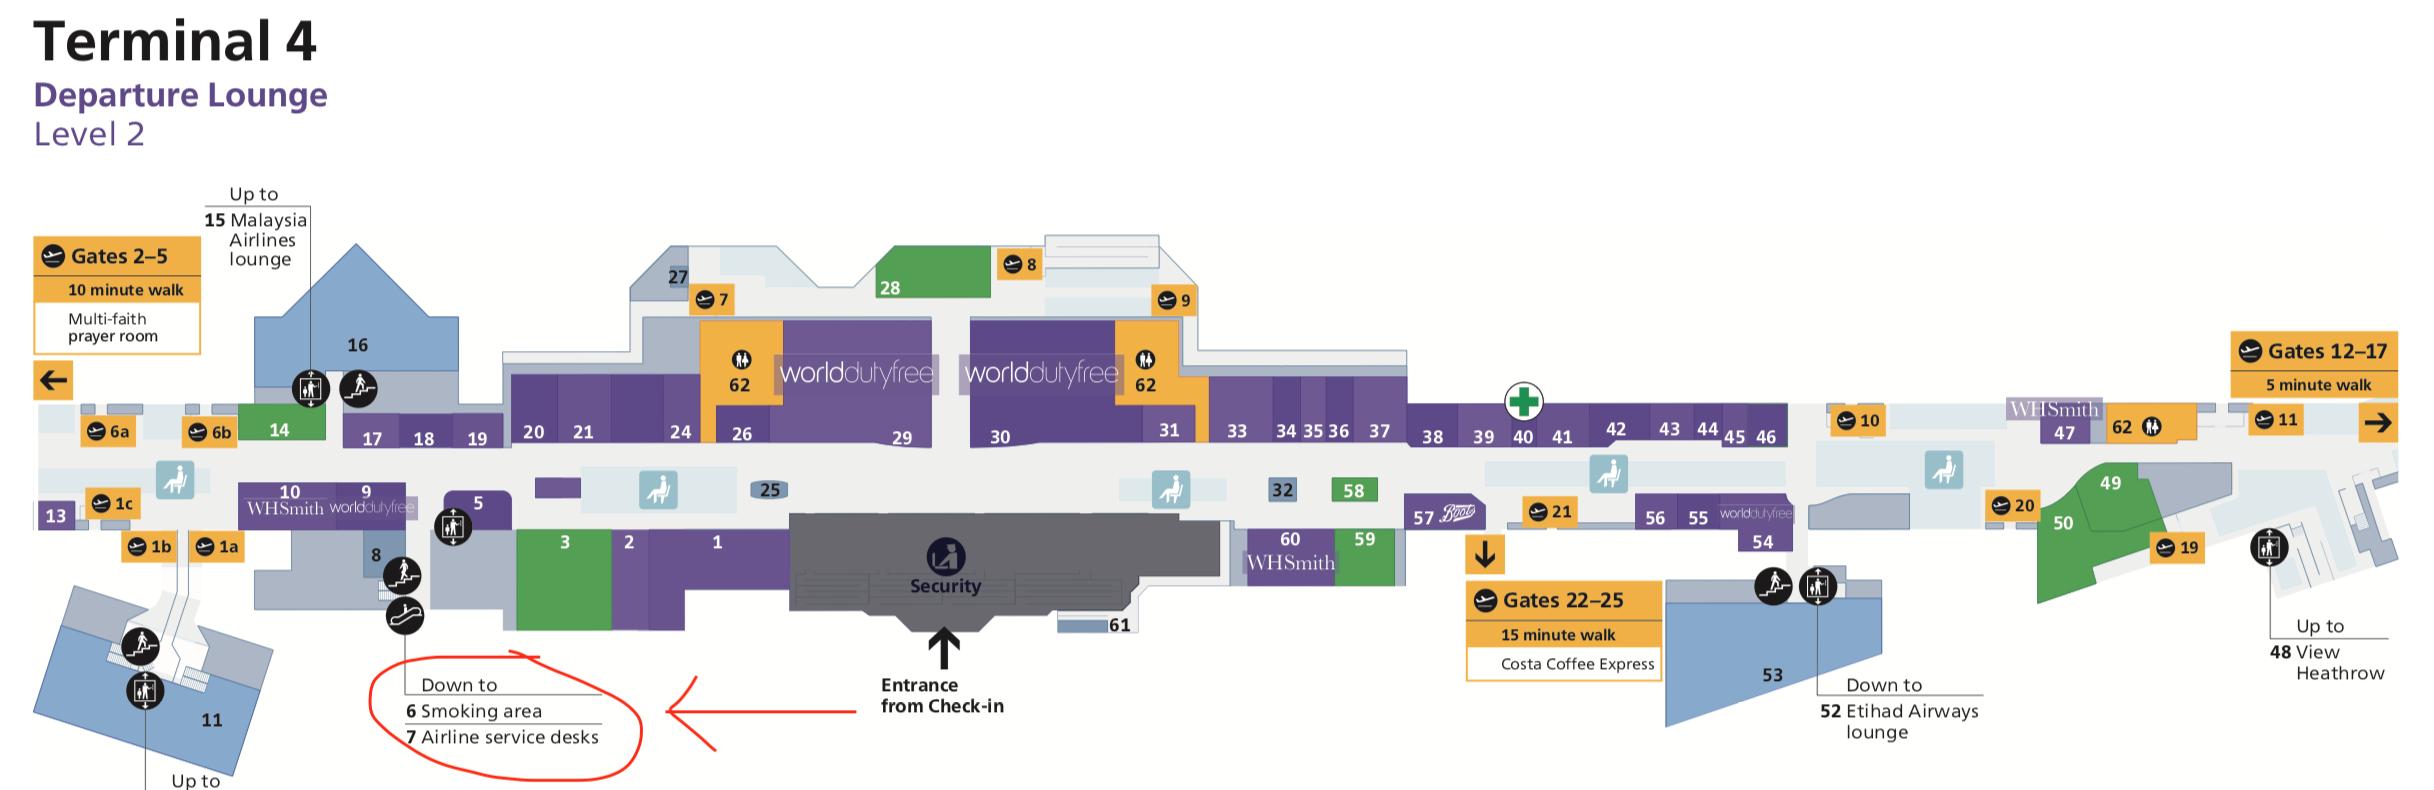 Where to Smoke Inside London Heathrow Airport - Live and ...